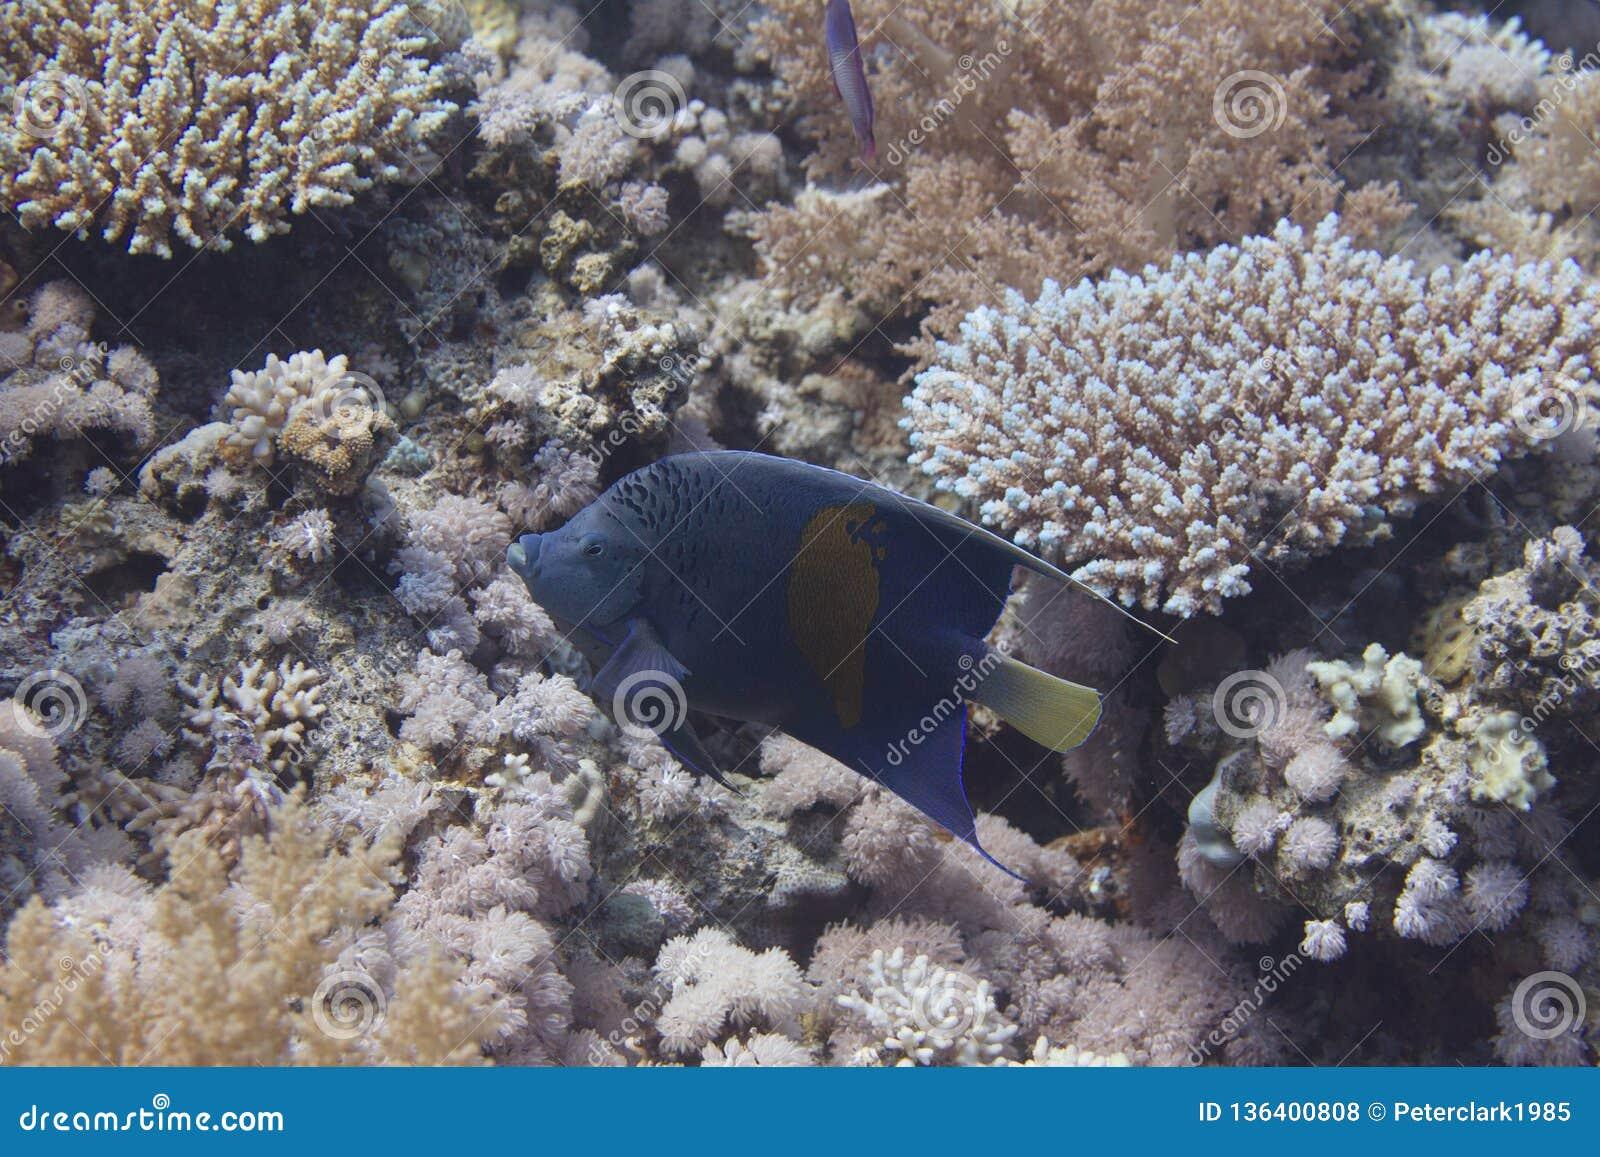 Yellowbar Angelfish in Red Sea